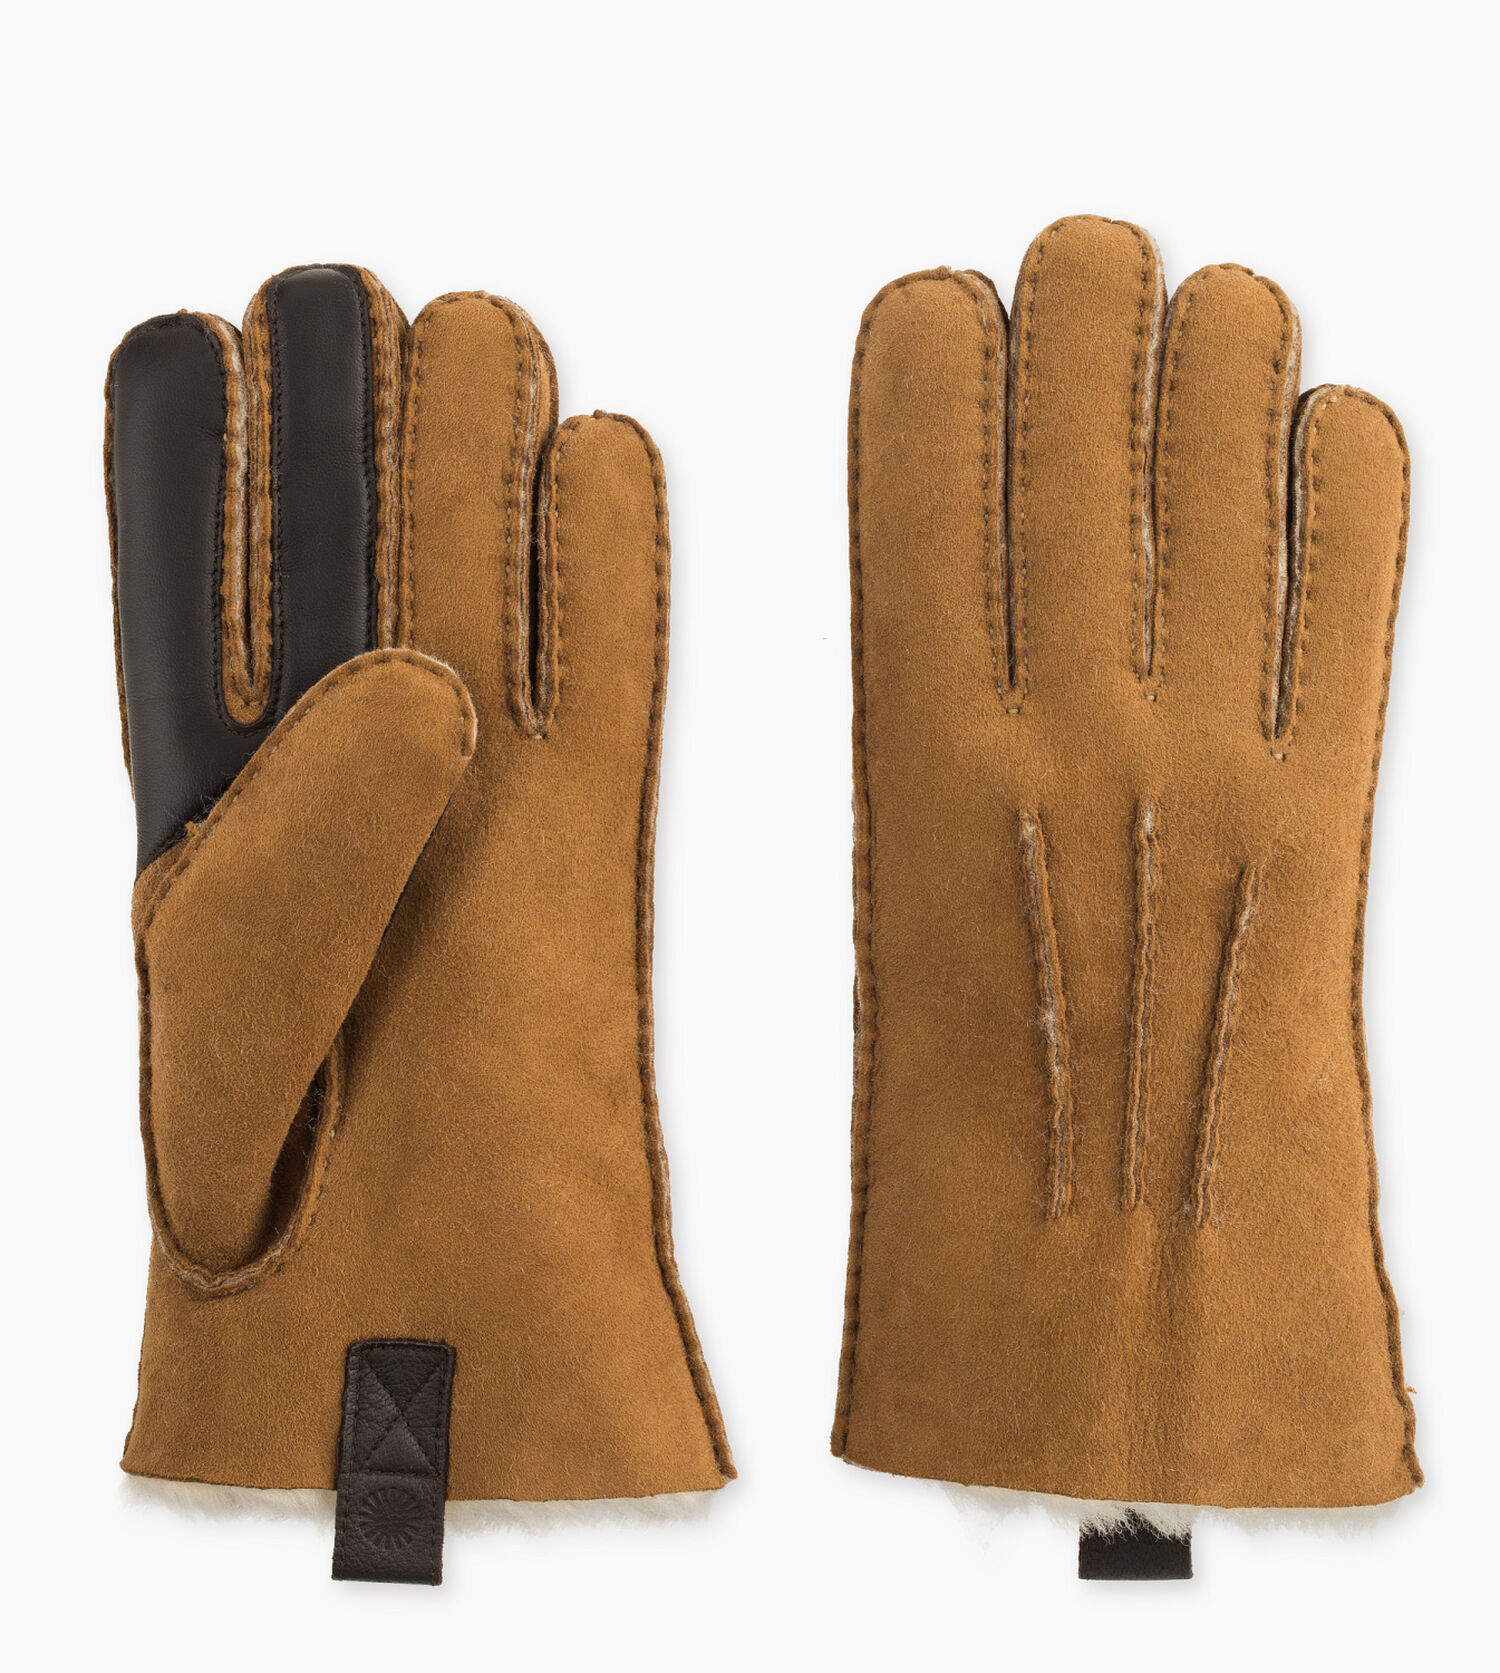 c667580888 Ugg Sheepskin Gloves Reviews Image Of